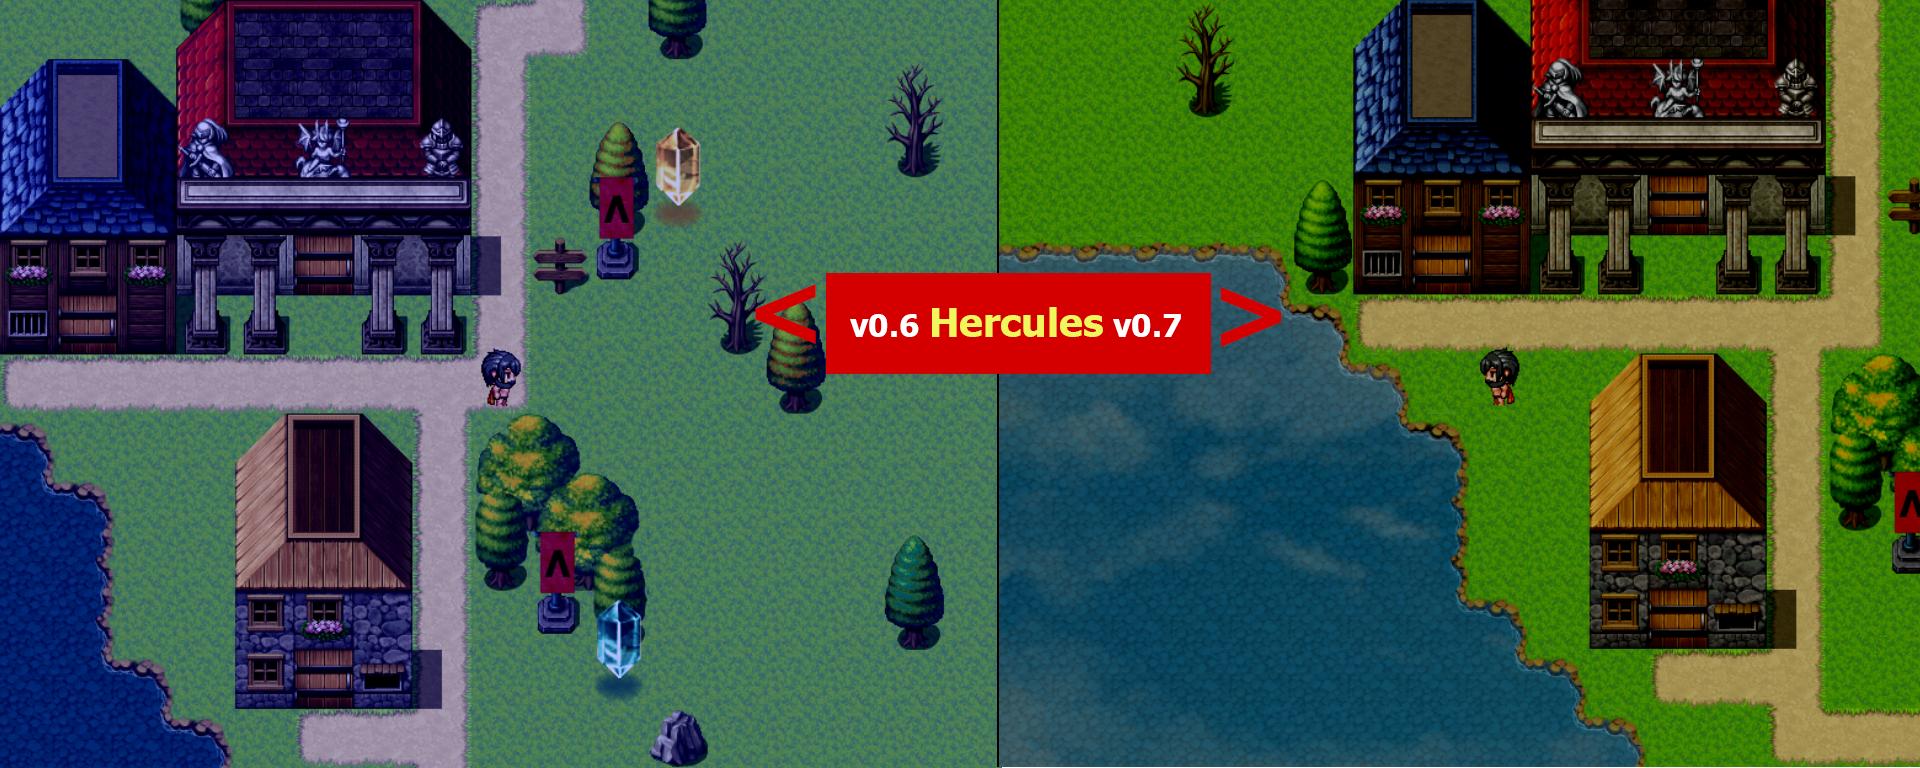 Hercules-v06-07